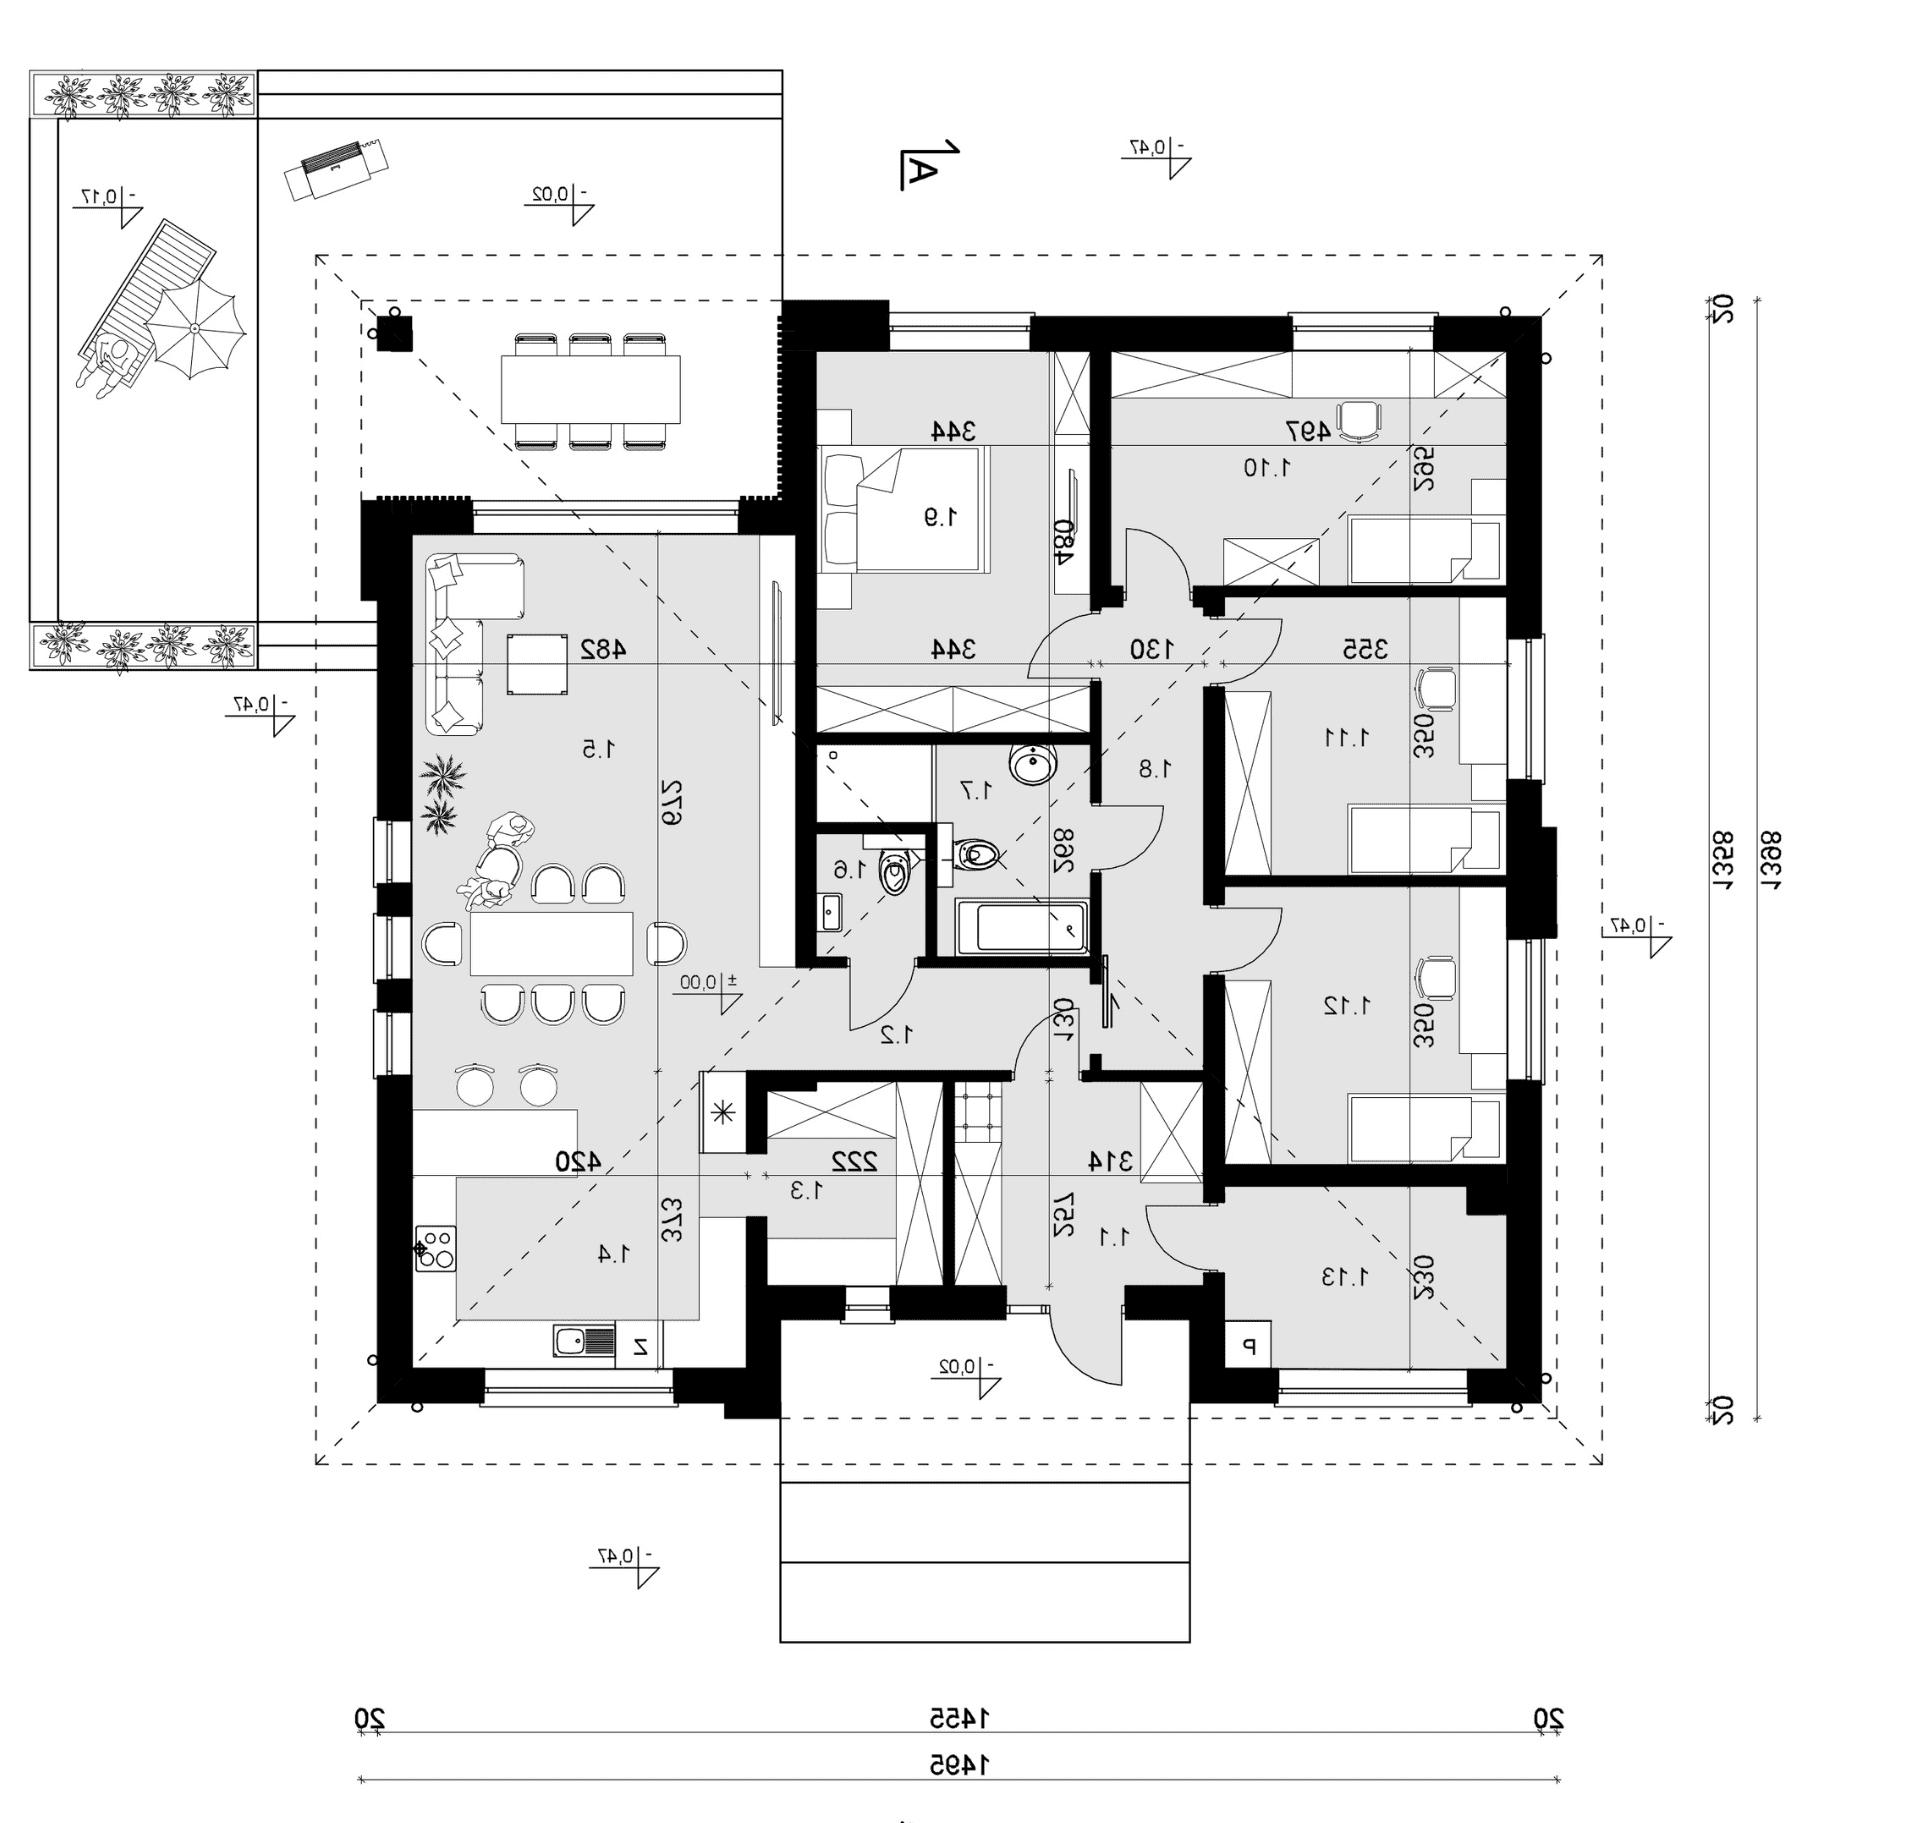 Rzut parteru - projekt domu SEJ-PRO 071 ENERGO - odbicie lustrzane